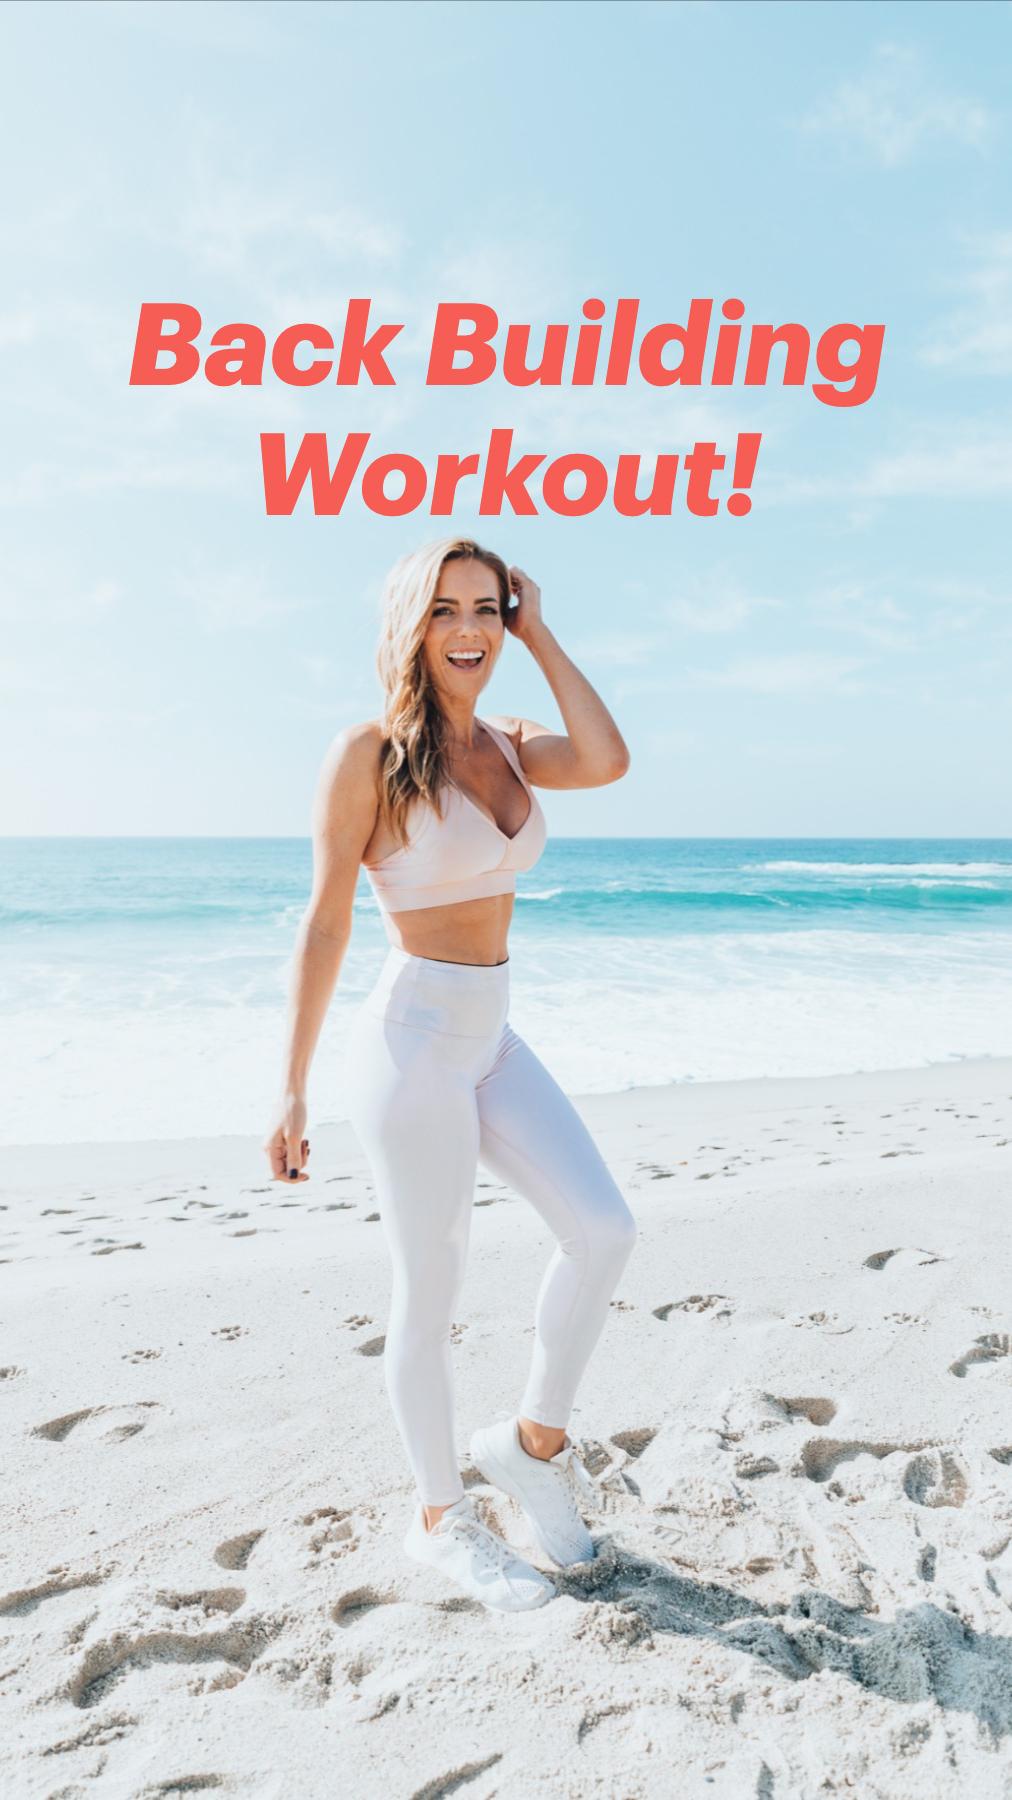 Back Building Workout!